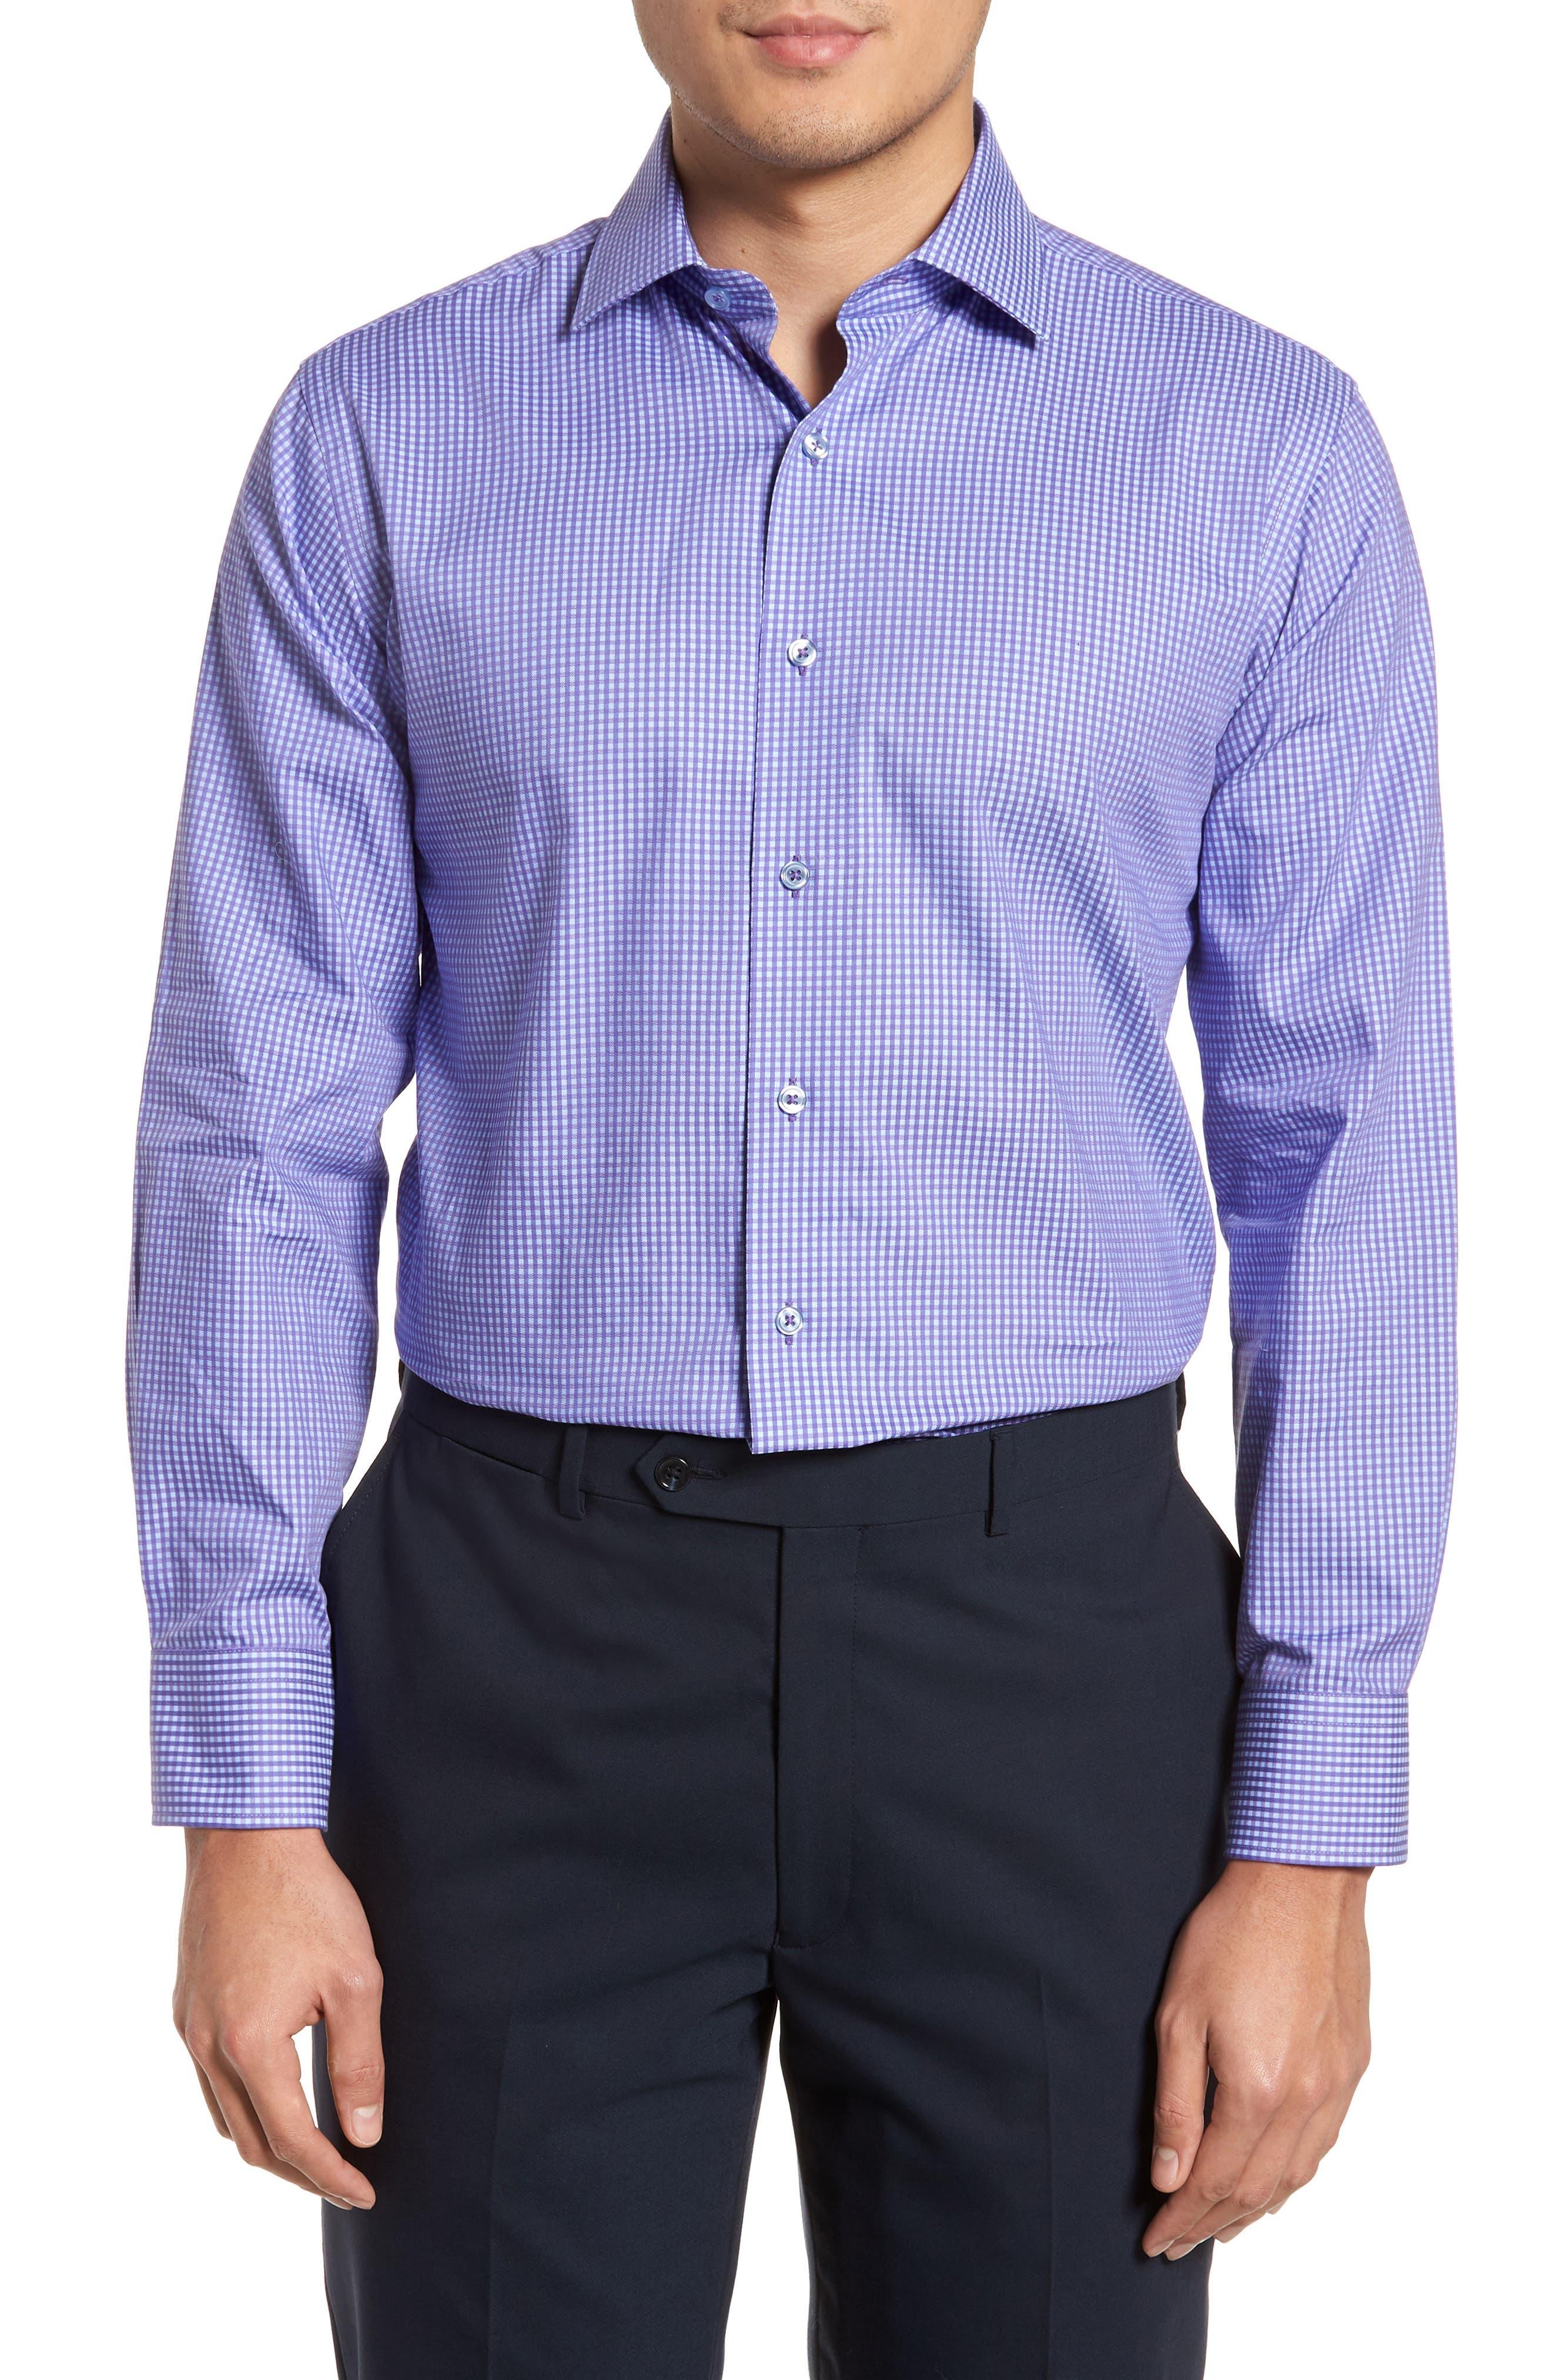 LORENZO UOMO,                             Trim Fit Mini Check Dress Shirt,                             Main thumbnail 1, color,                             510